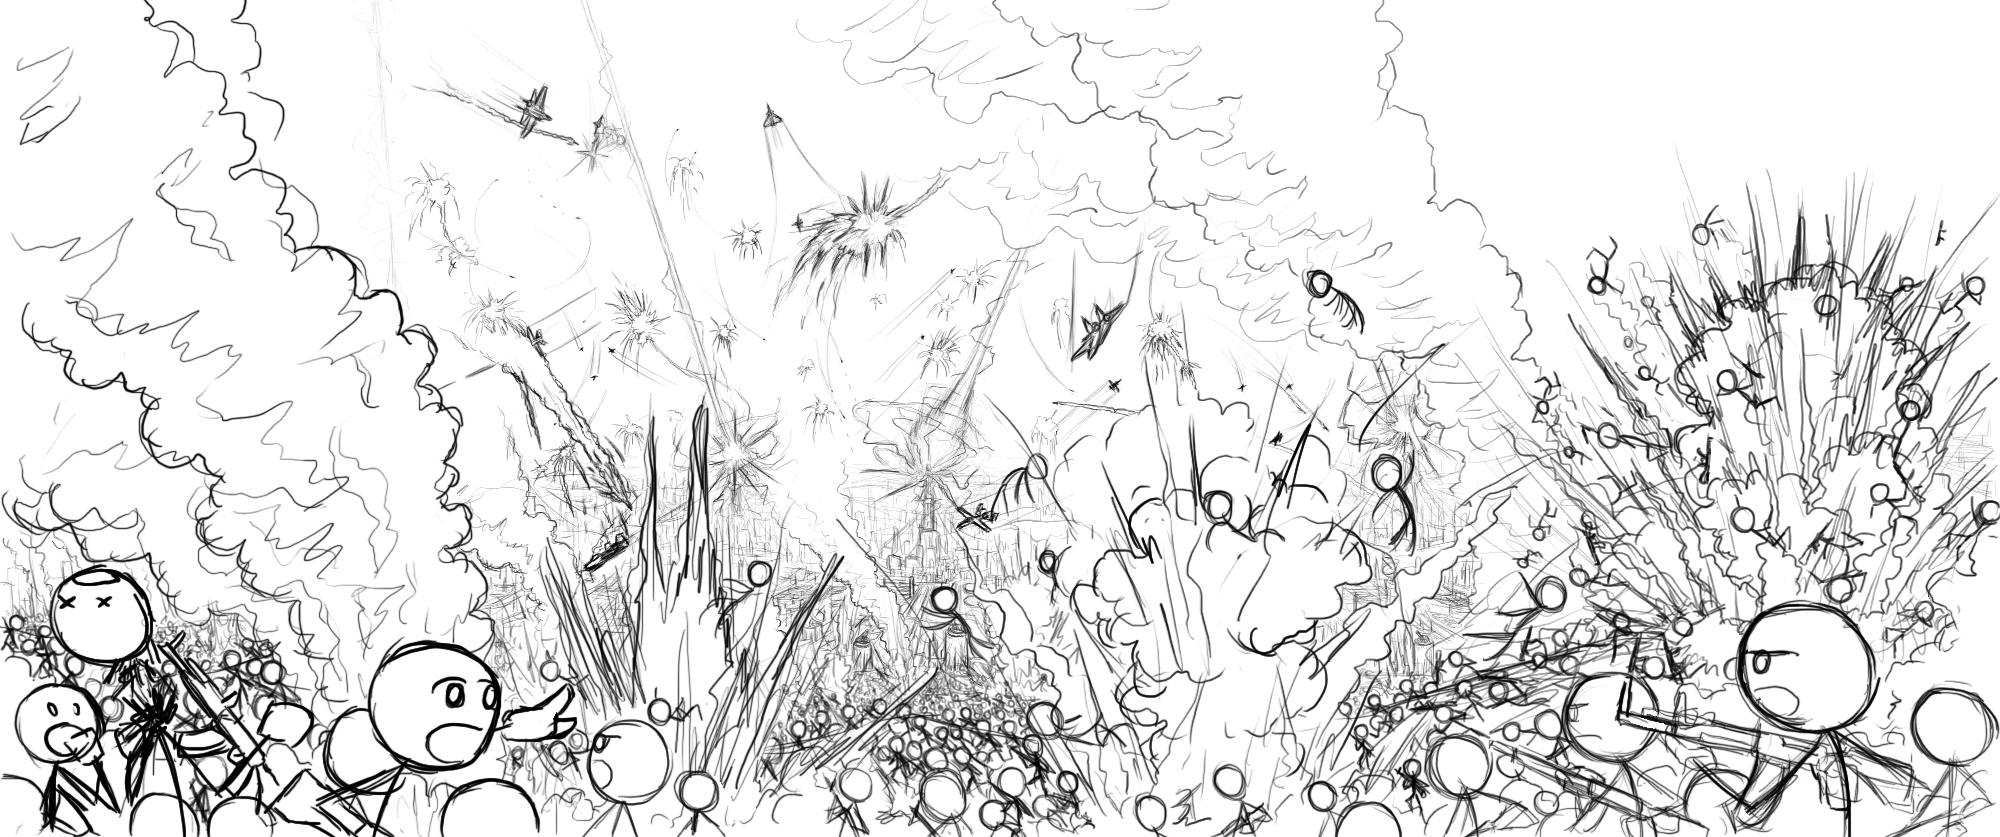 Drawn wars stick war Drawing Pic War War Drawing